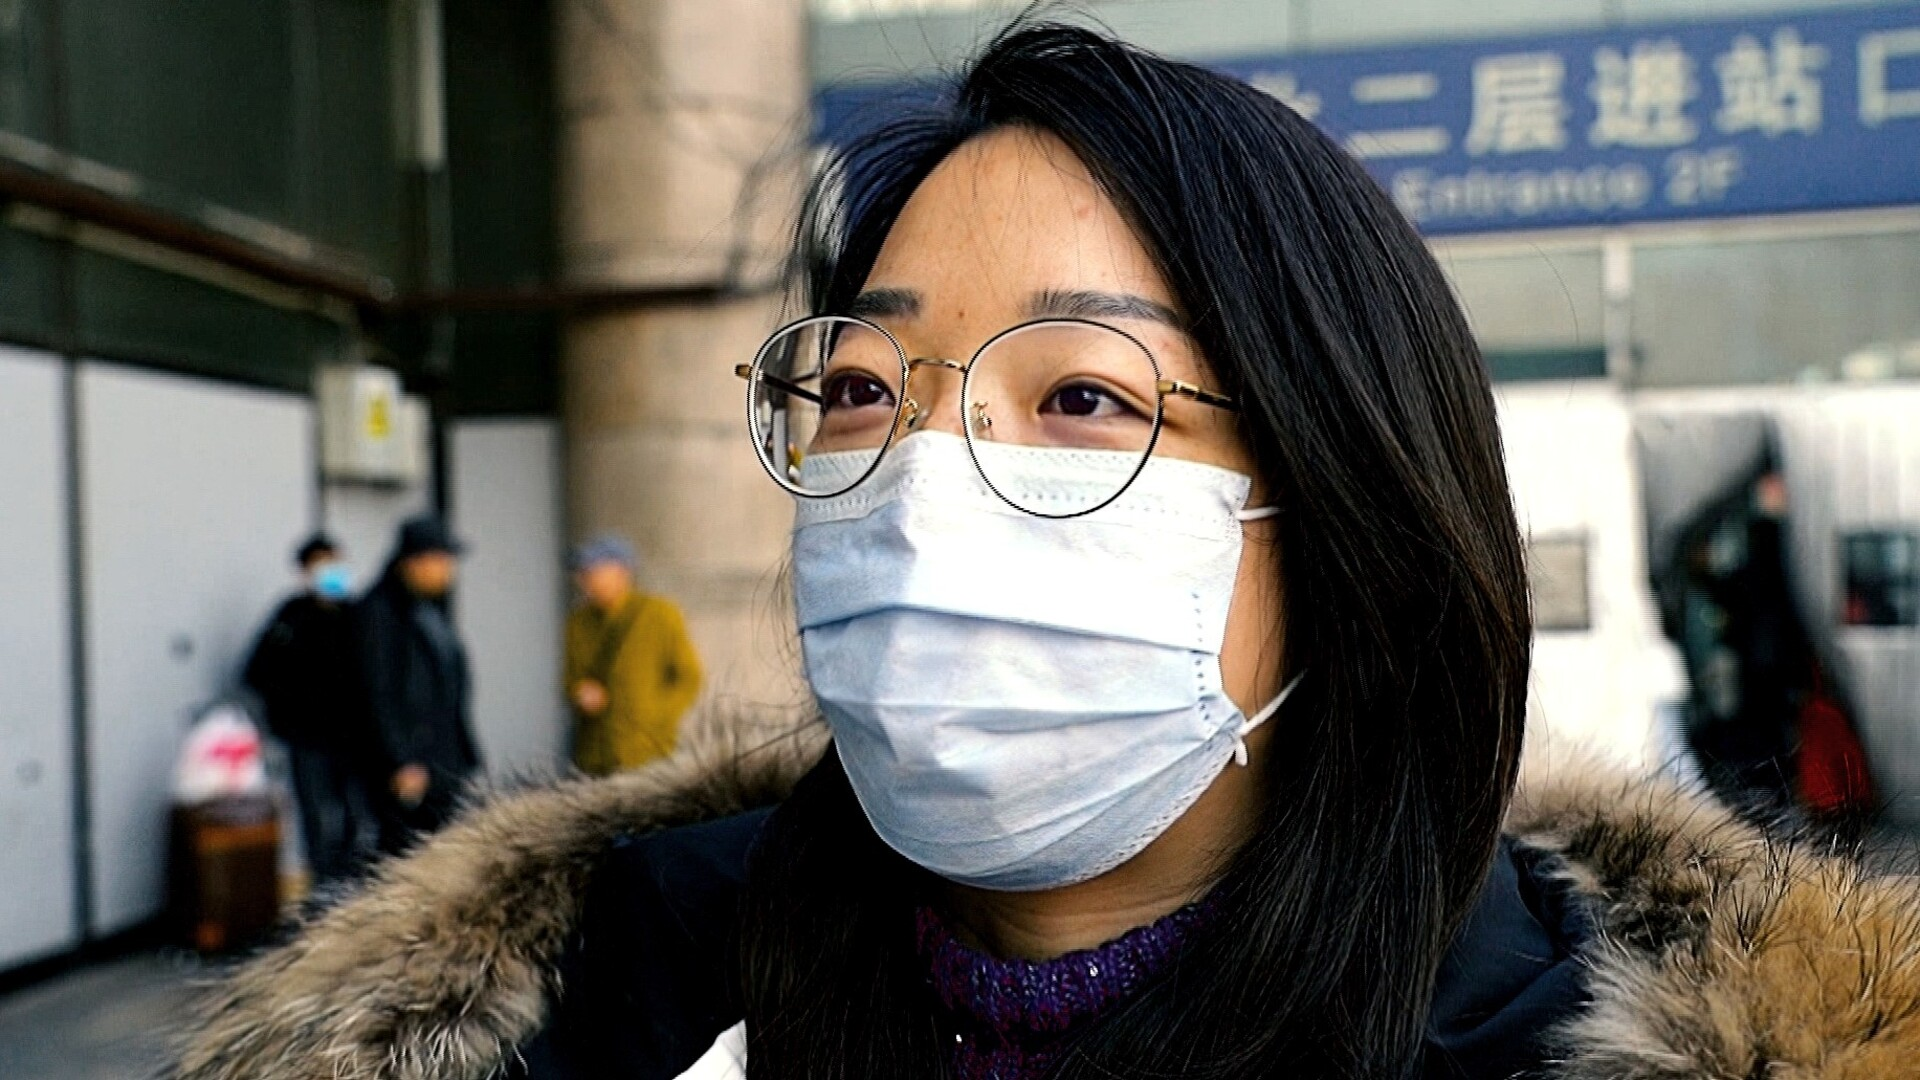 China battles coronavirus outbreak: All the latest updates